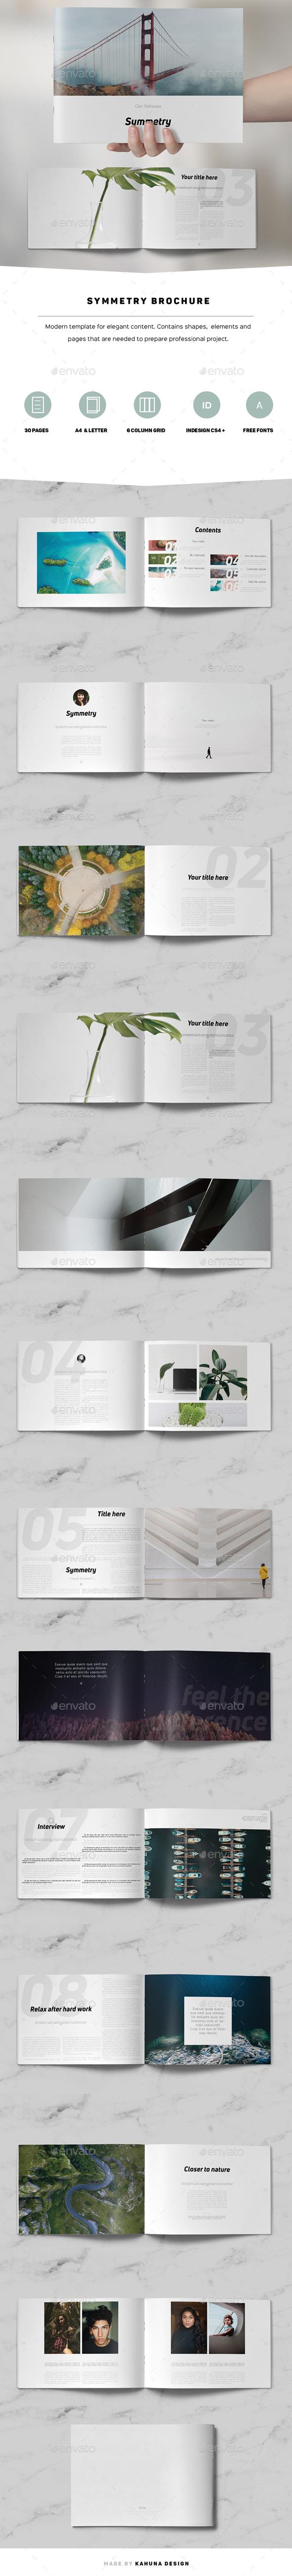 Symmetry Minimal Brochure - Corporate Brochures